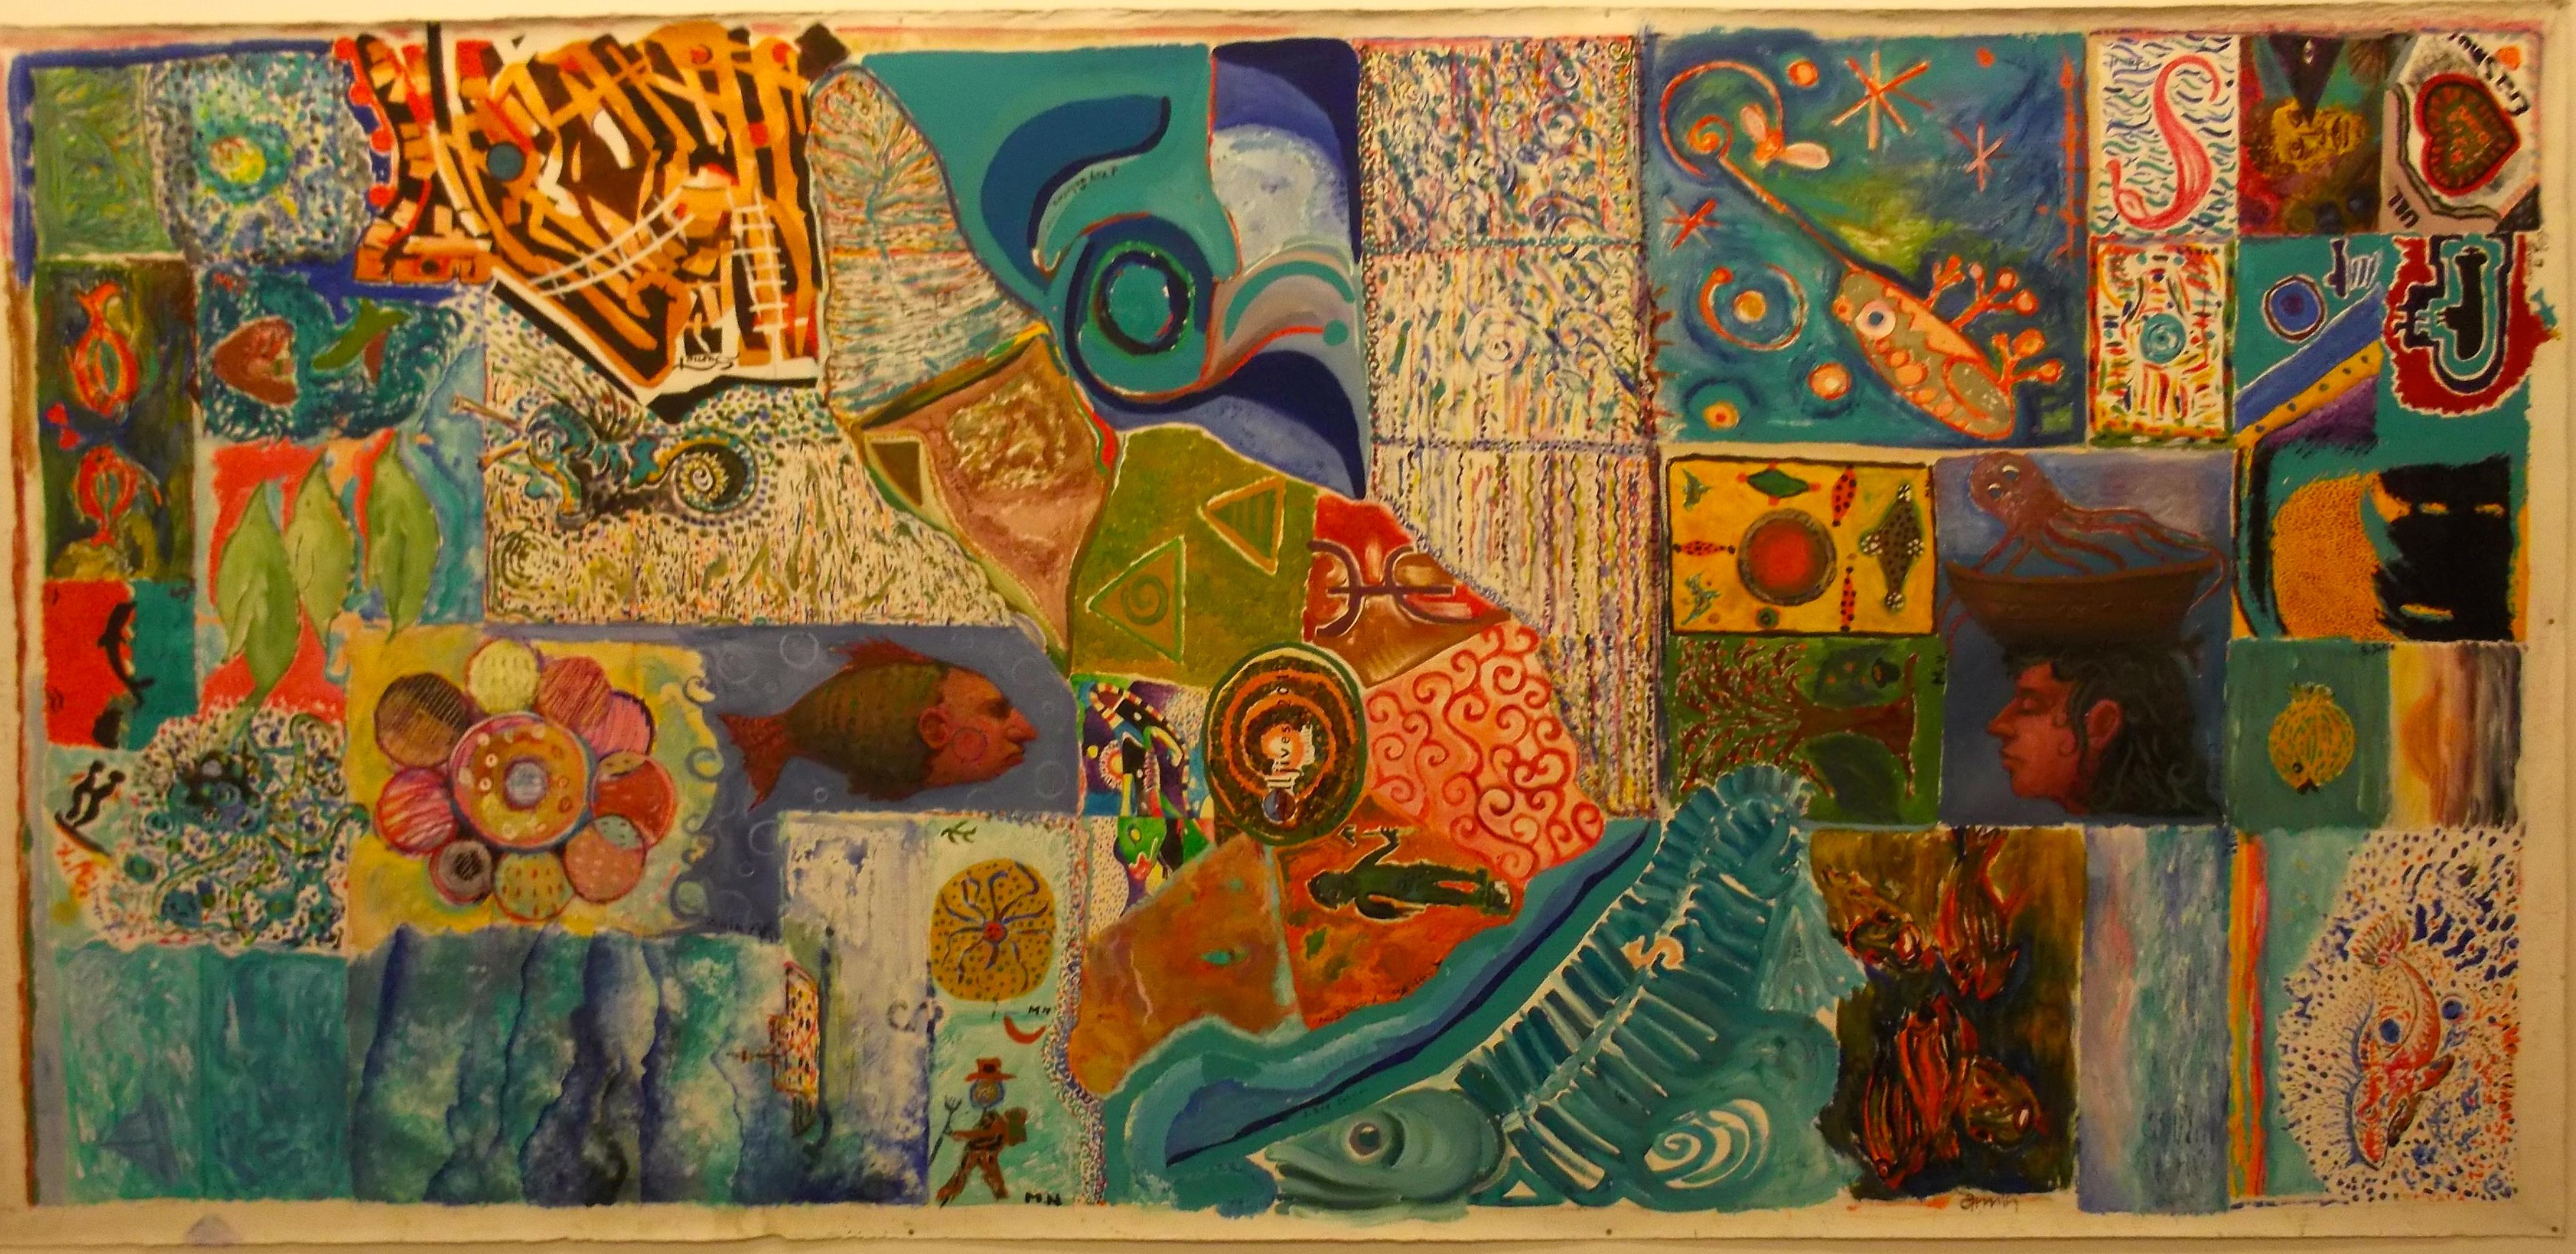 COL-ART-PAINTING La Laguna 2011